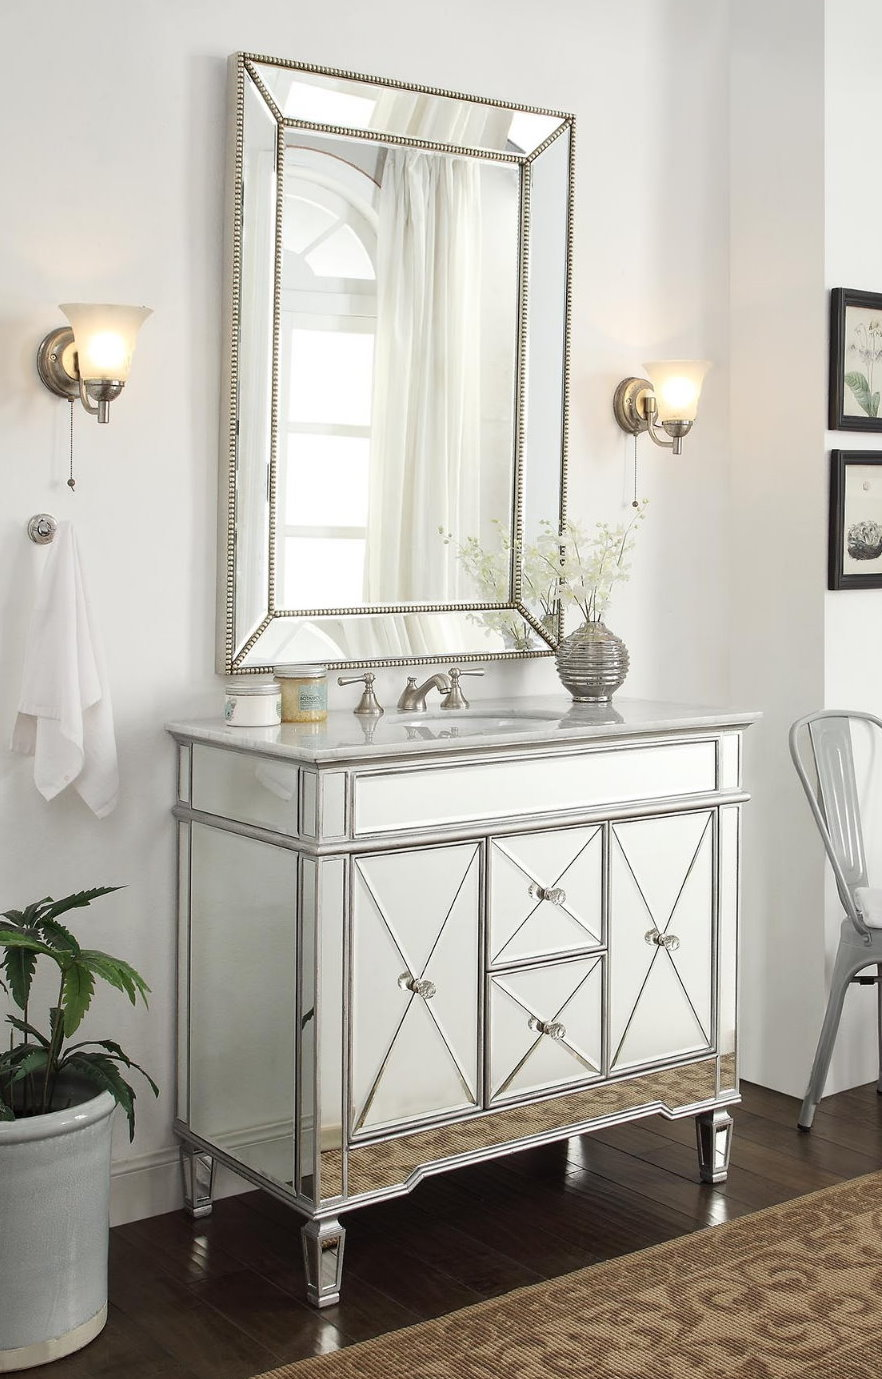 44 inch adelina mirrored bathroom vanity cabinet white top